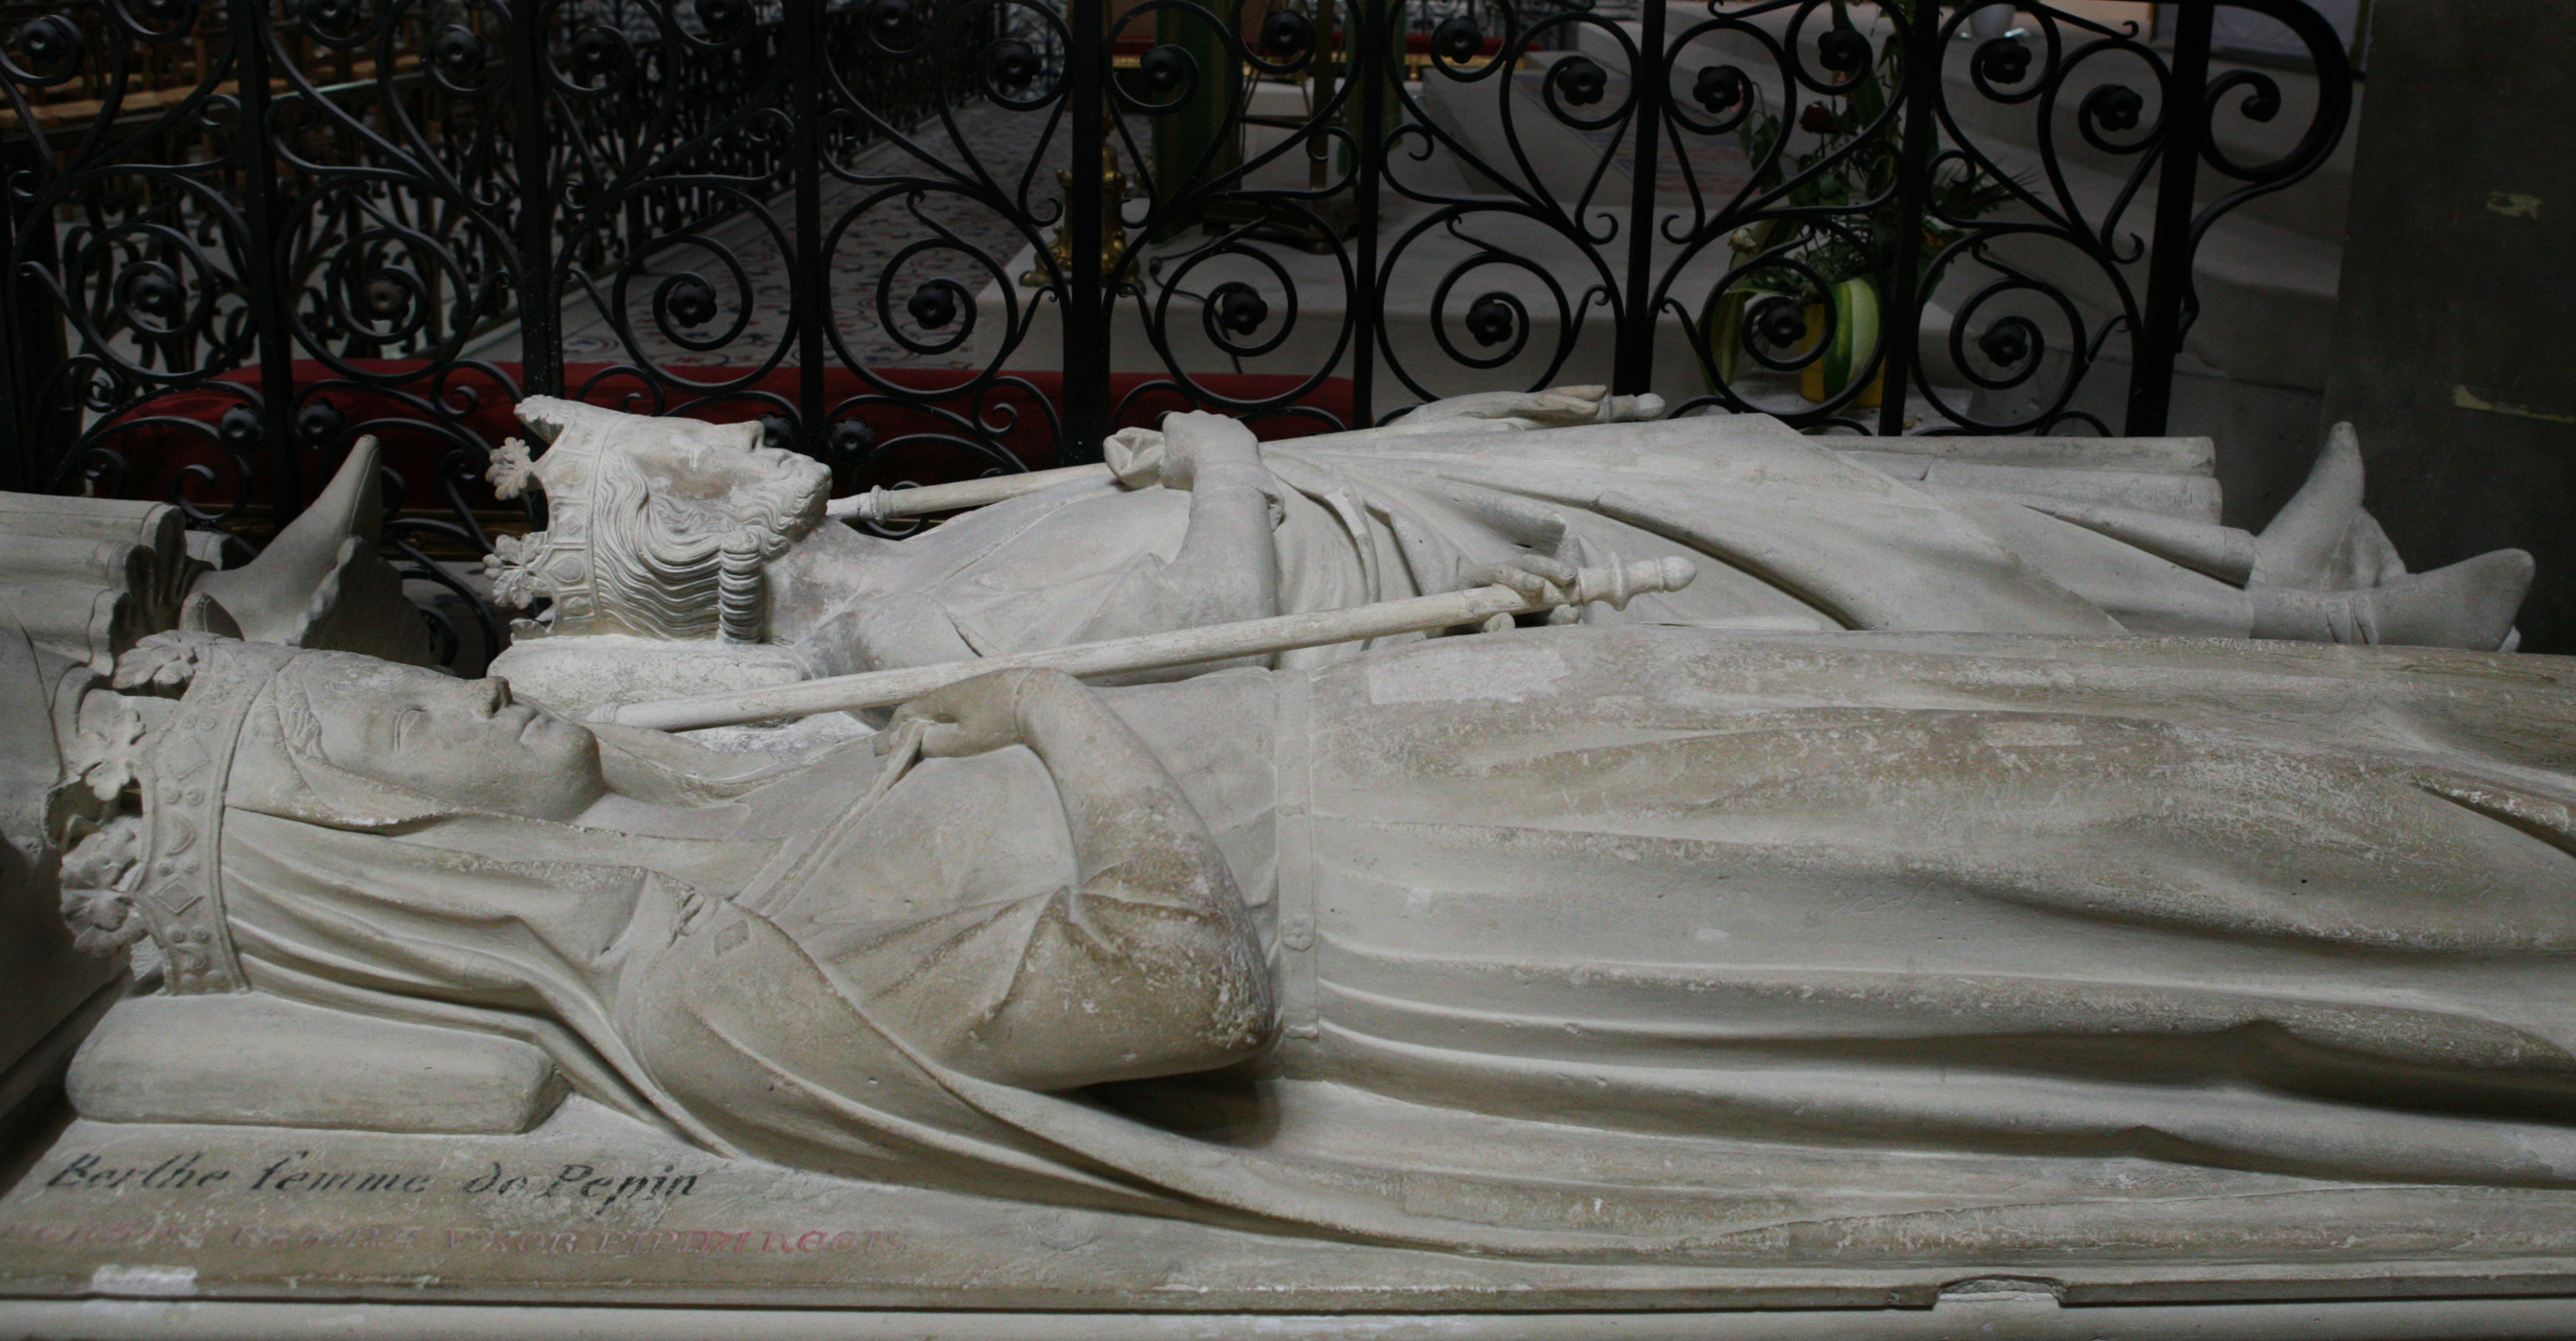 Bertrada's and Pepin's tombs